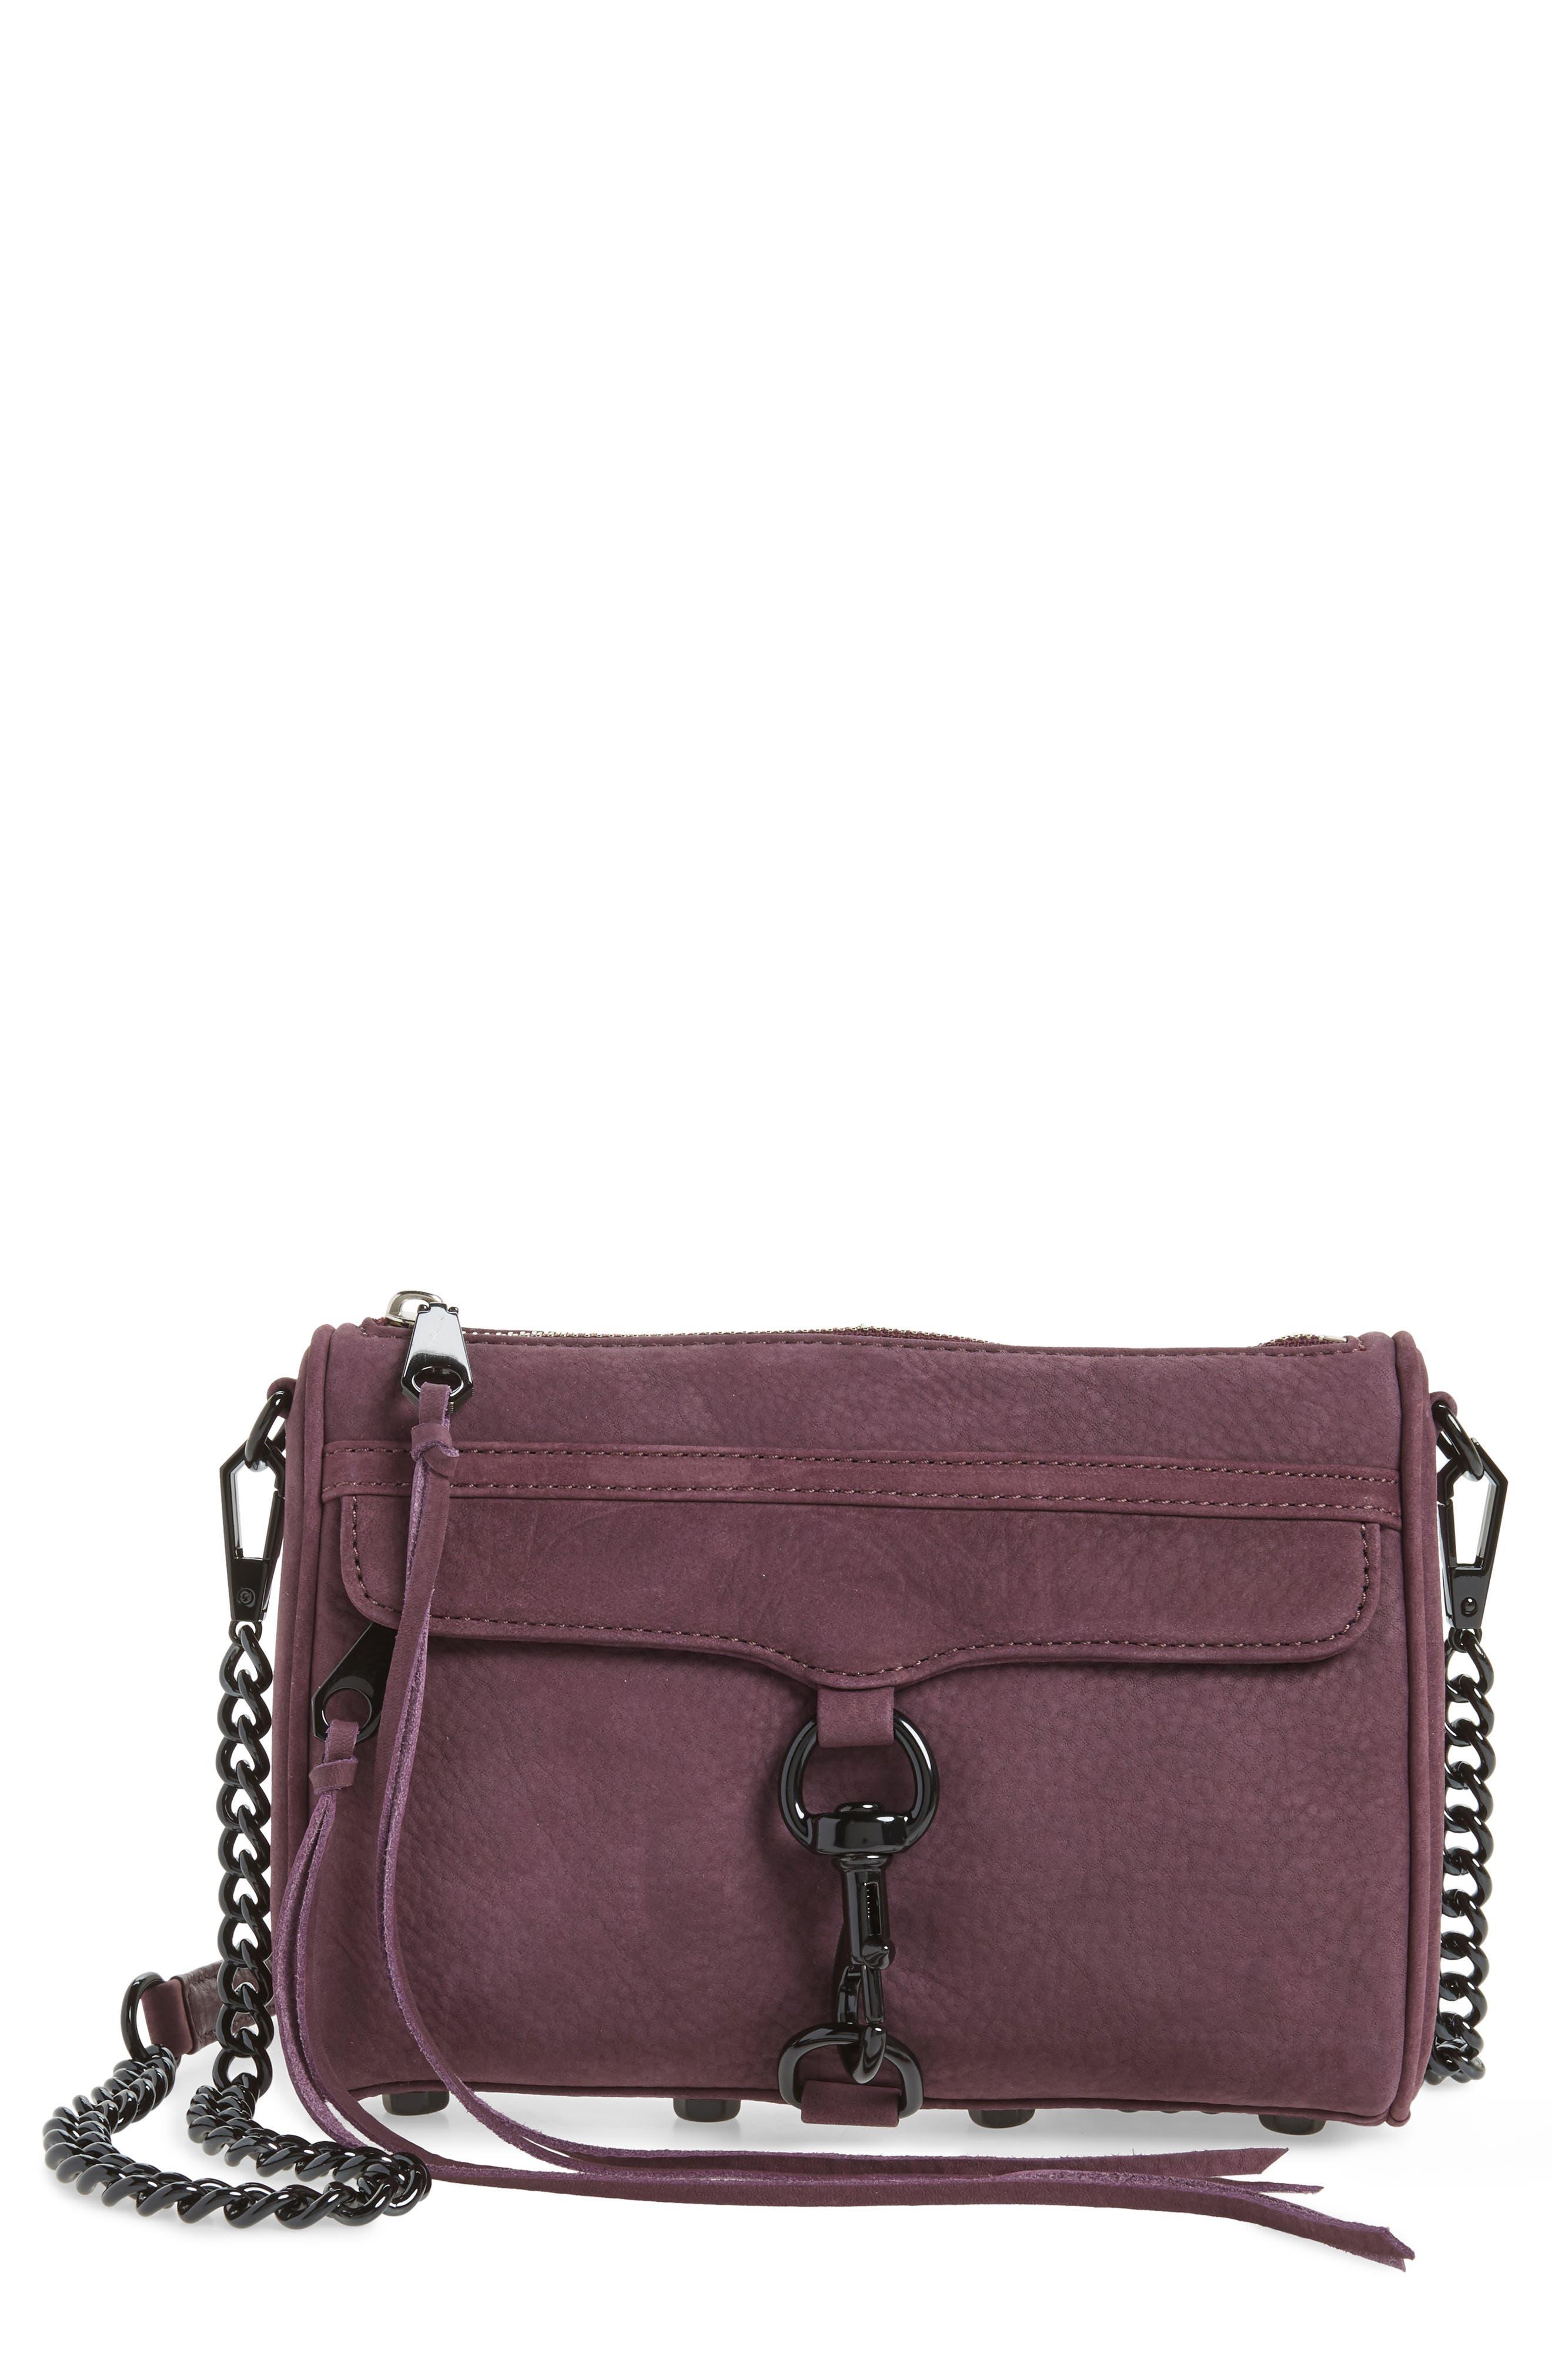 Alternate Image 1 Selected - Rebecca Minkoff Mini MAC Nubuck Convertible Crossbody Bag